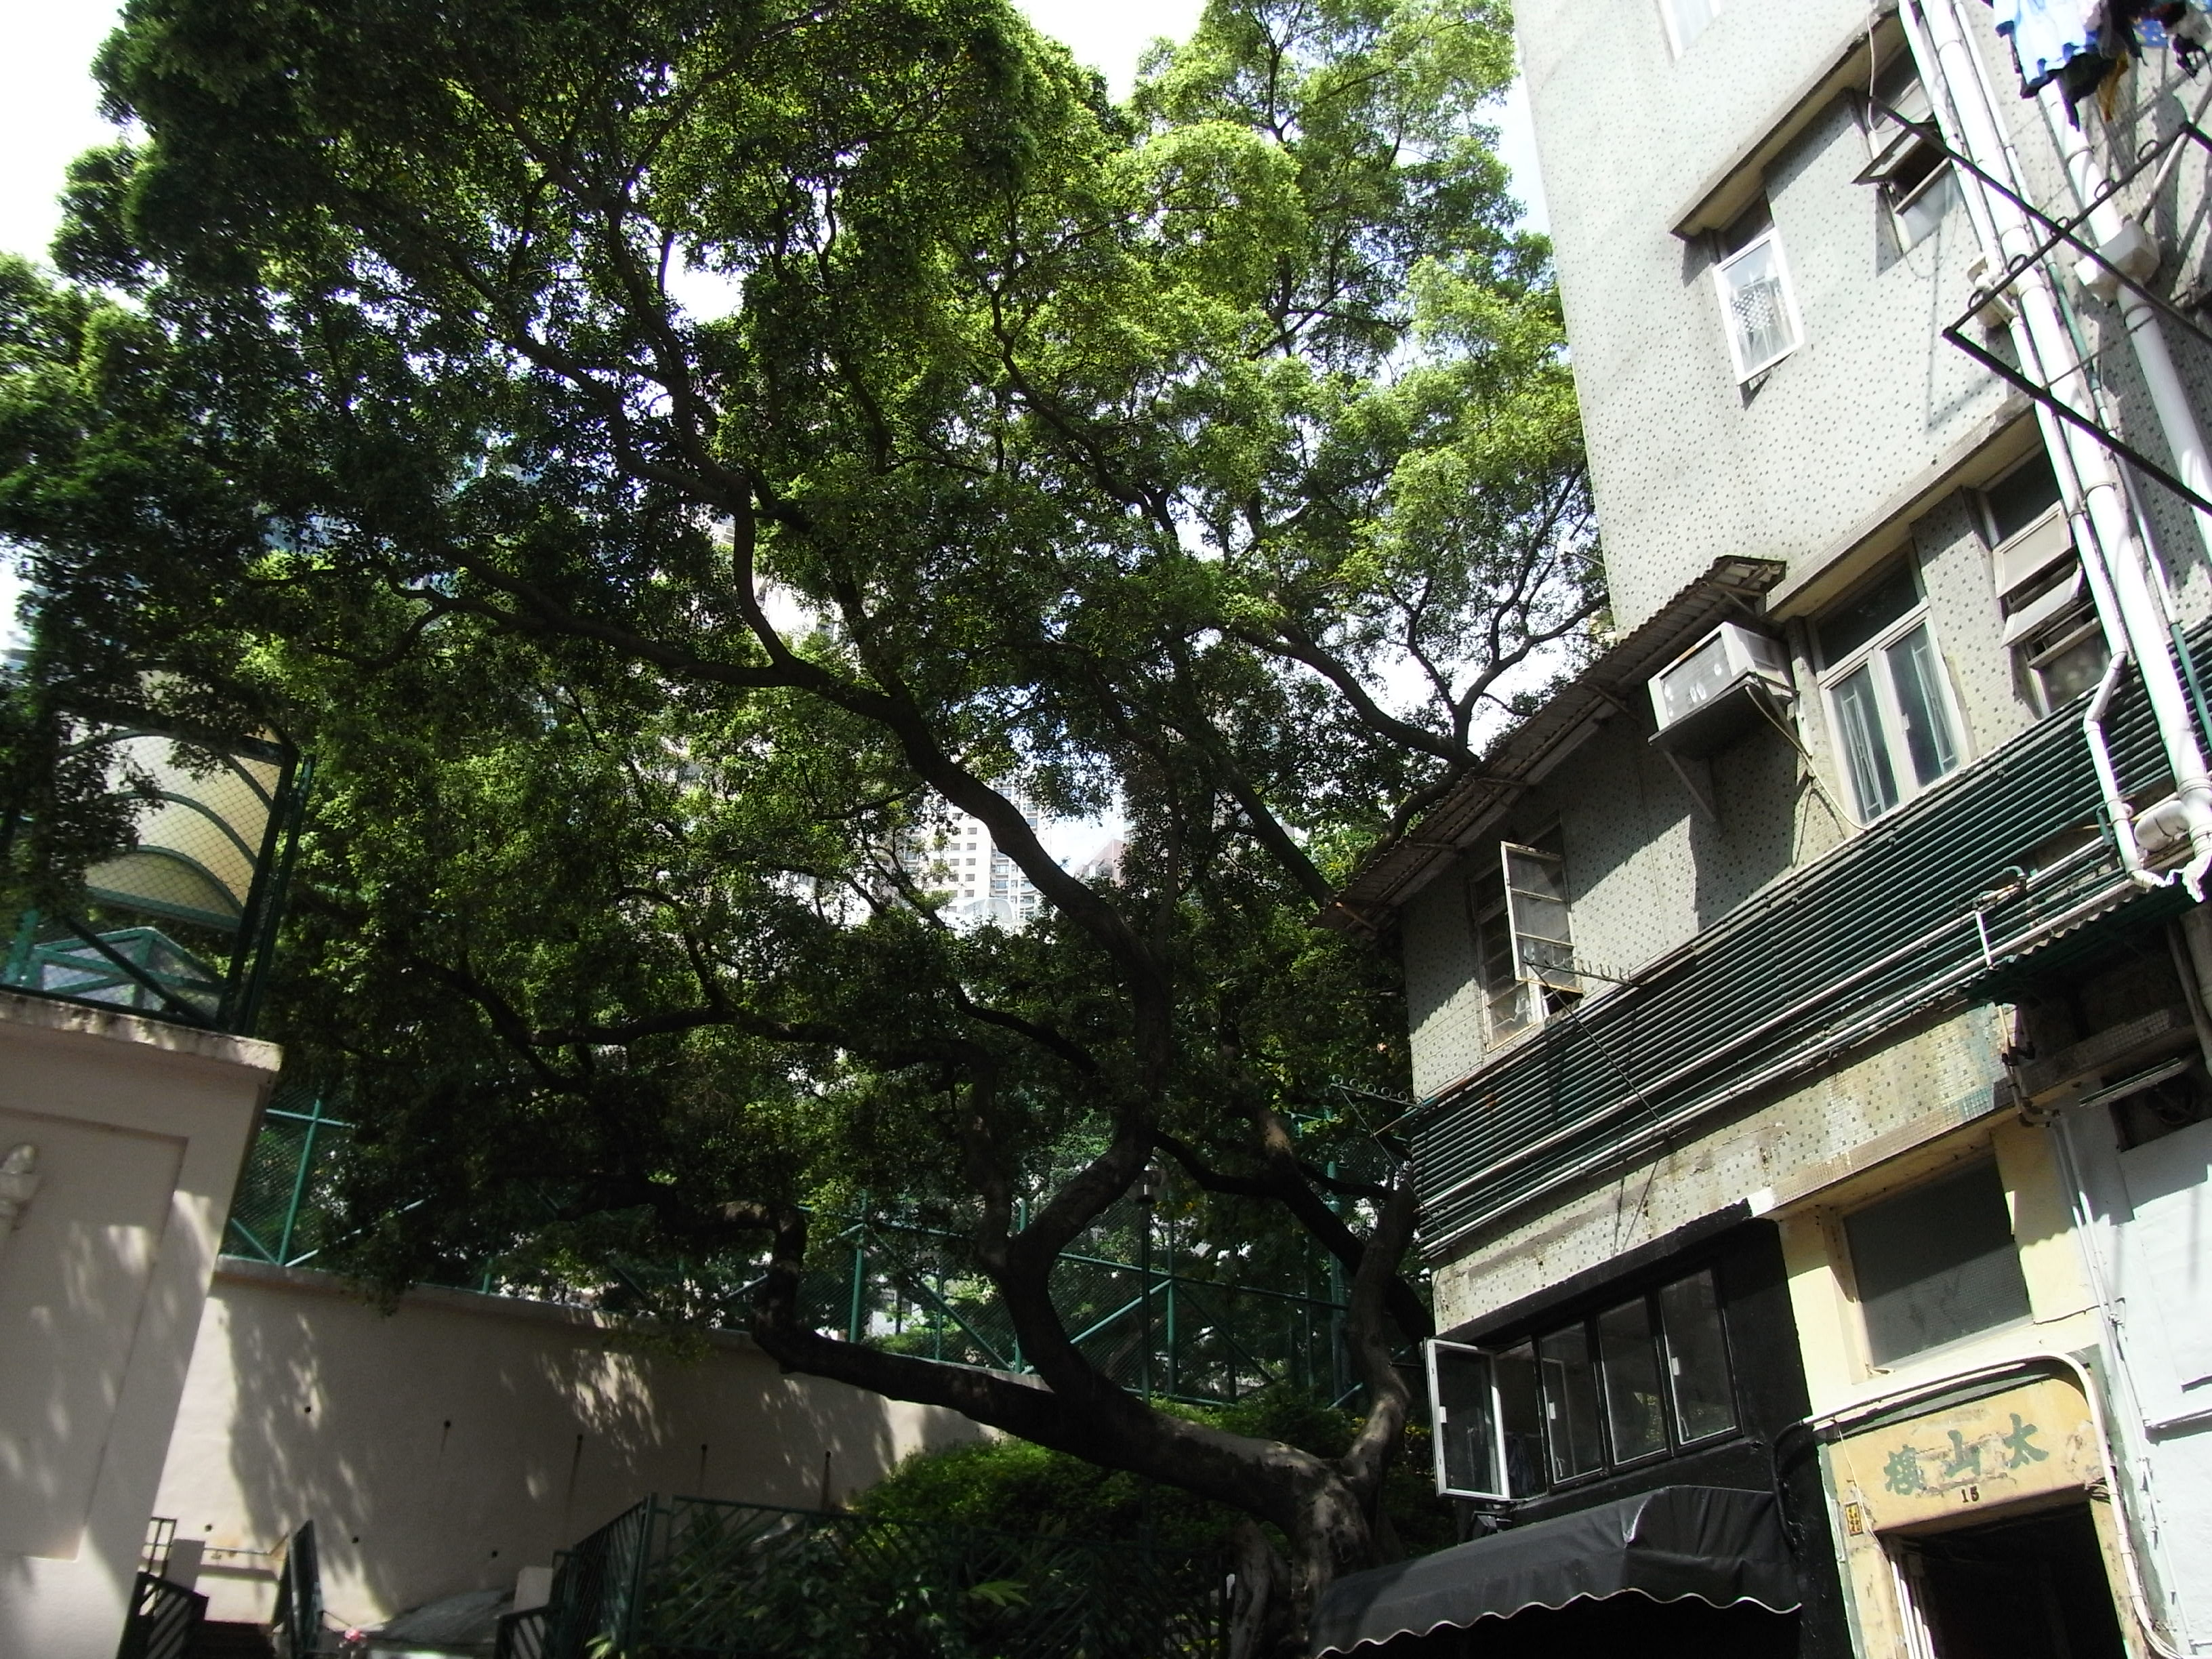 File:HK Sheung Wan 15 Upper Station Street Tai Shan House N Blake Garden  Banyan